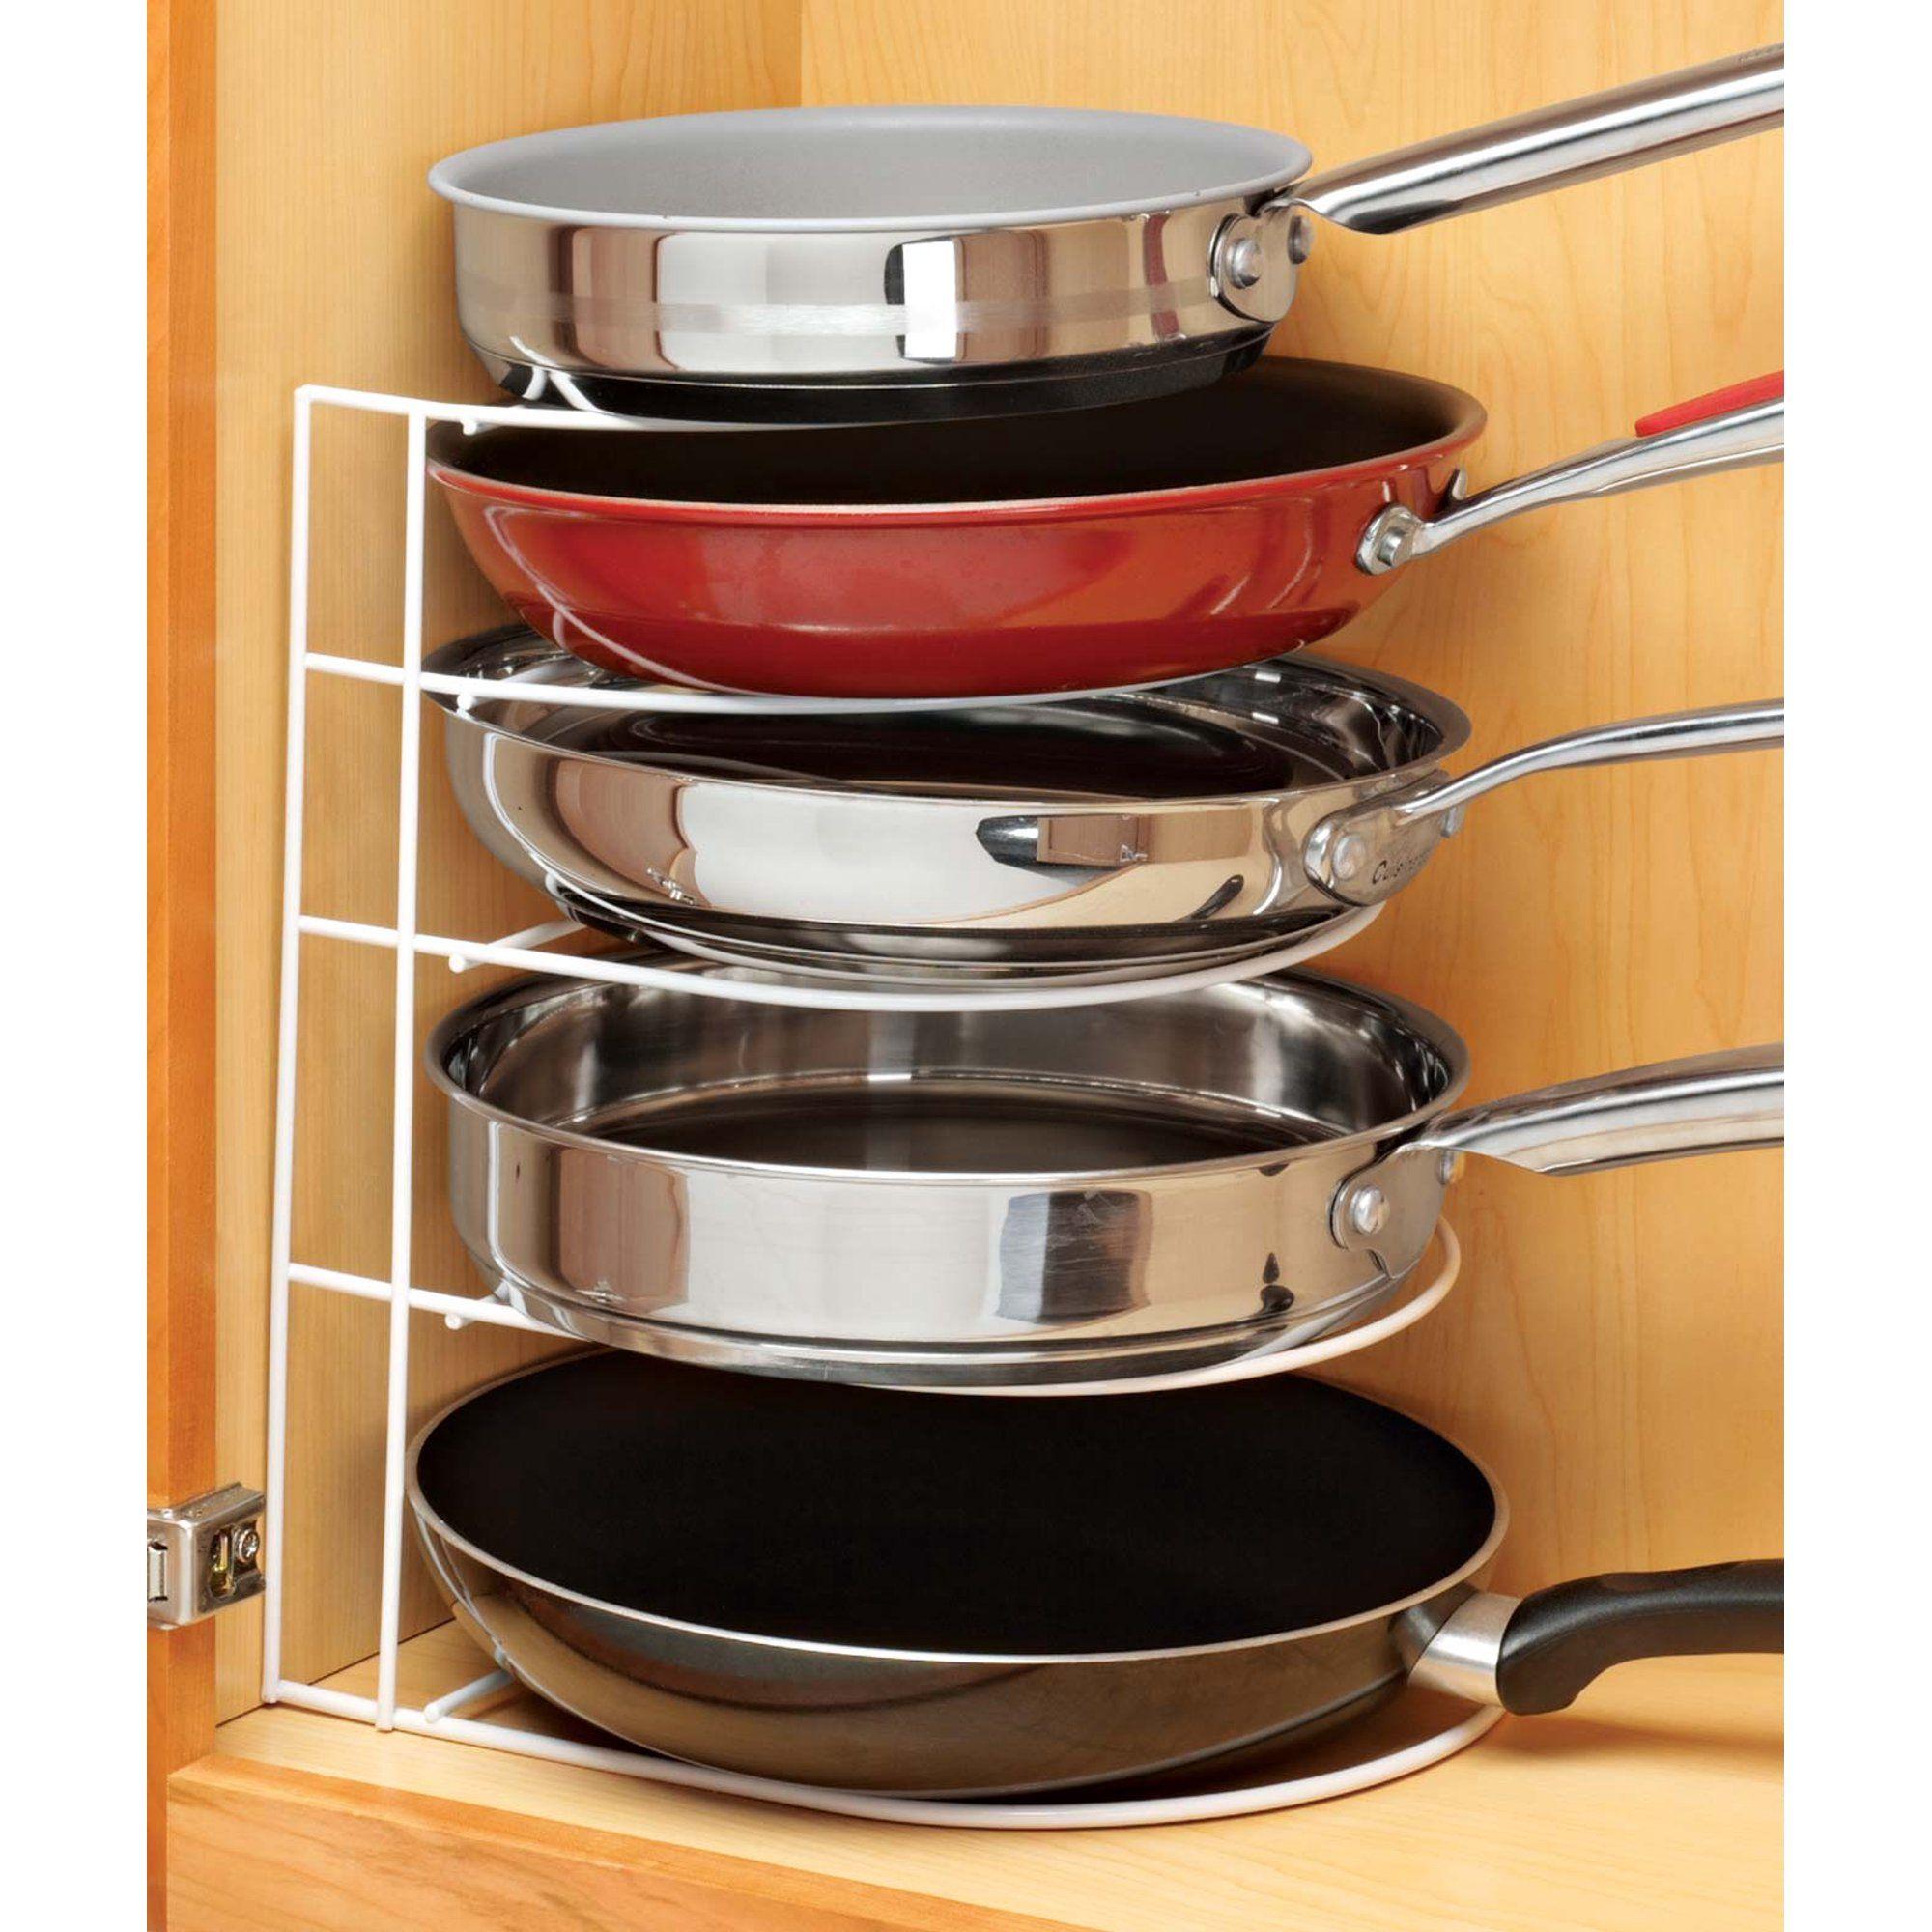 Frying Pan Organizer Walmart Com Kitchen Storage Hacks Kitchen Organization Diy Kitchen Pans Organization